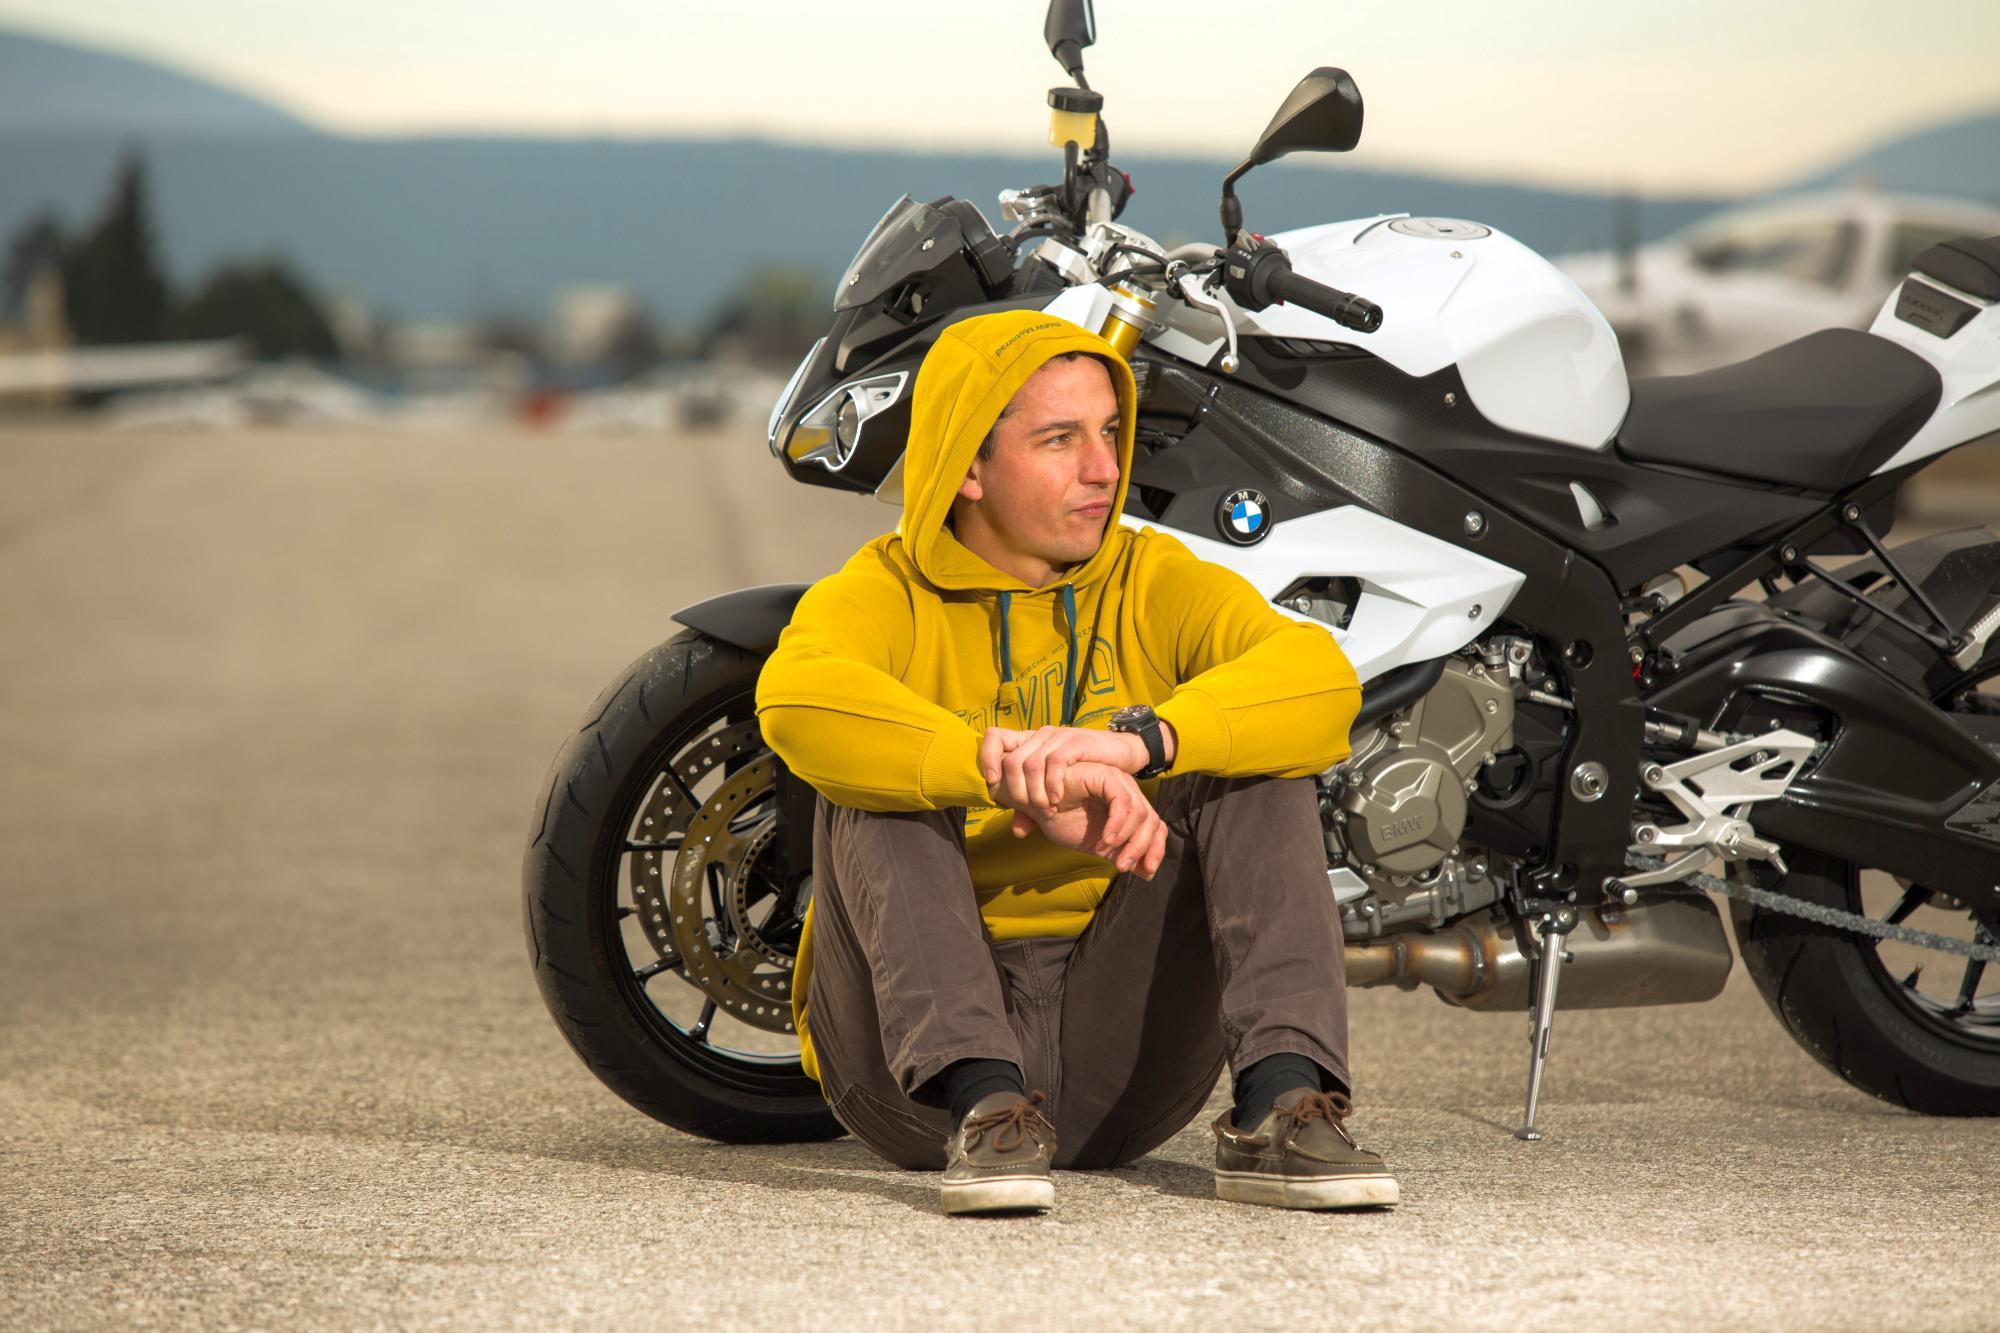 bmw bekleidung 2016 motorrad fotos motorrad bilder